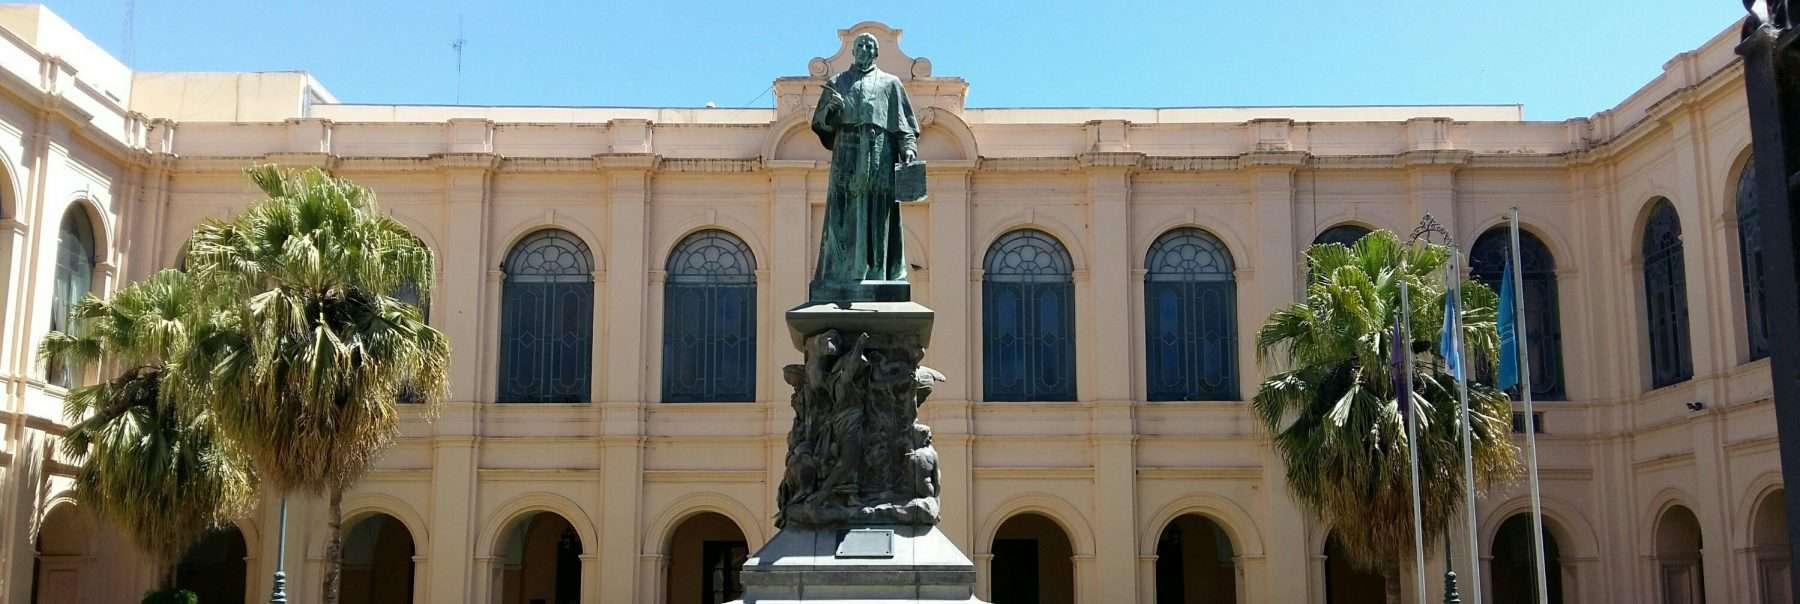 Manzana Jesuitica, Cordoba, Argentina